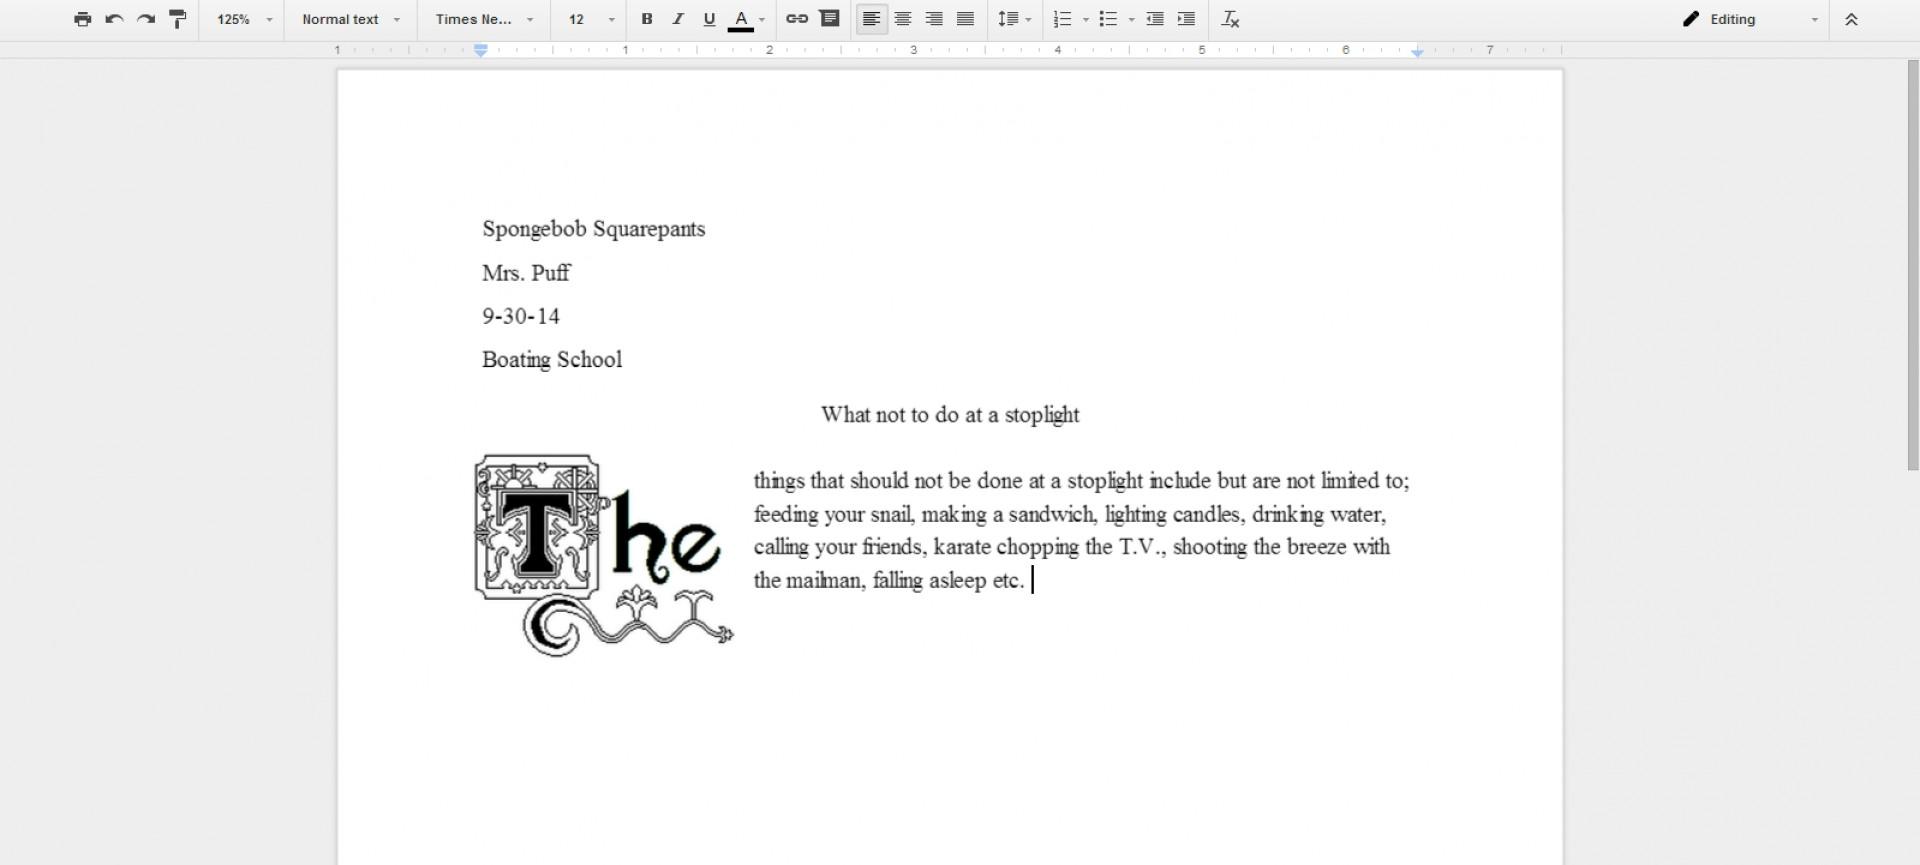 004 H6so62h Spongebob The Essay Font Top Name Copy And Paste 1920